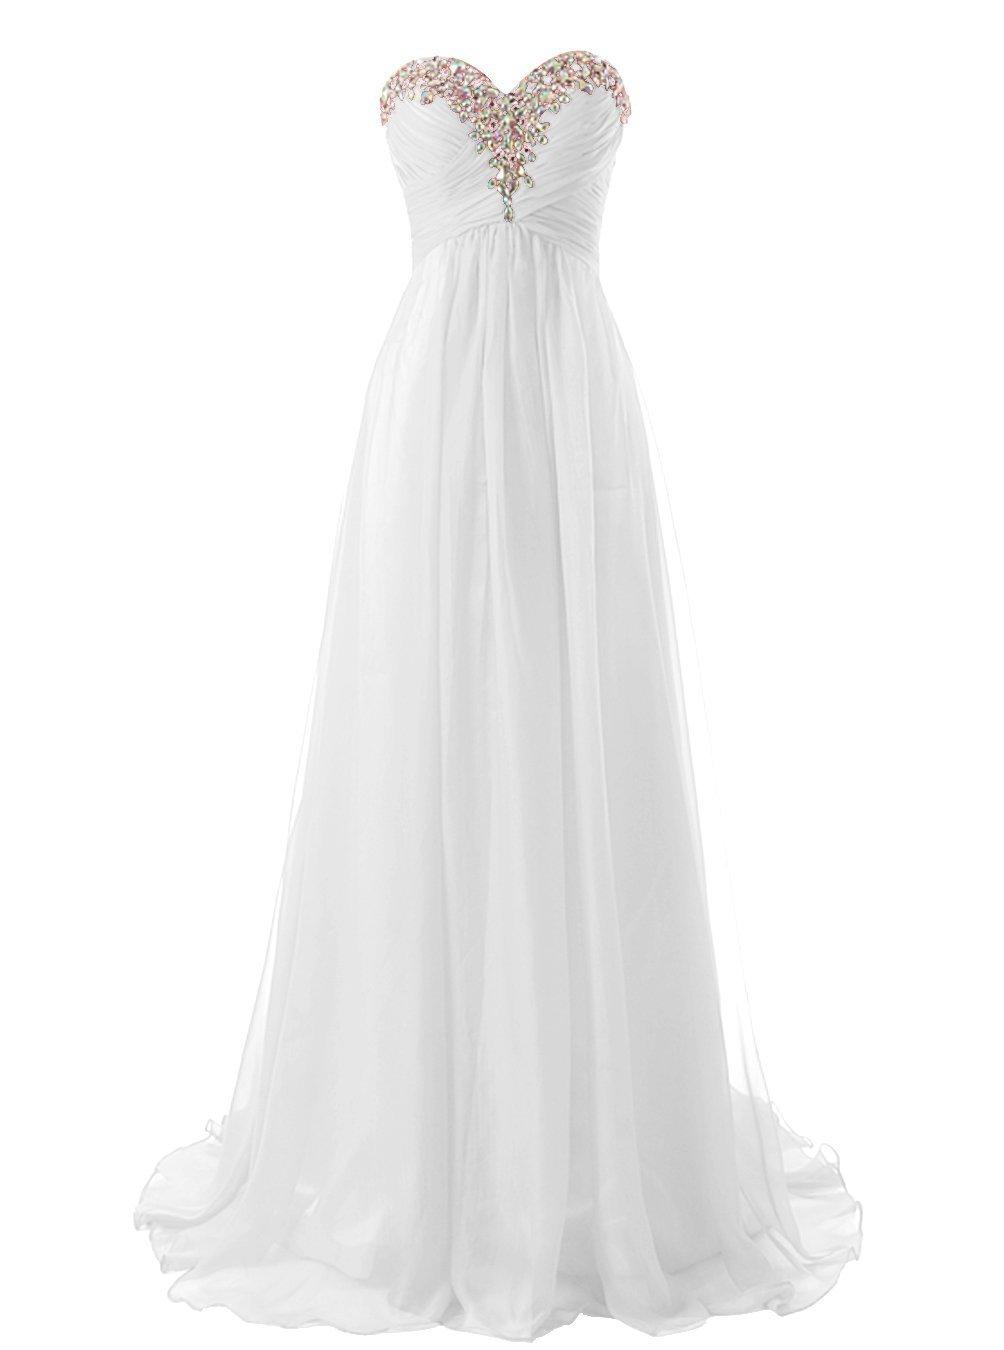 Snowskite Sweetheart Long Beaded Chiffon Bridesmaid Dress Evening Dress Ivory 24